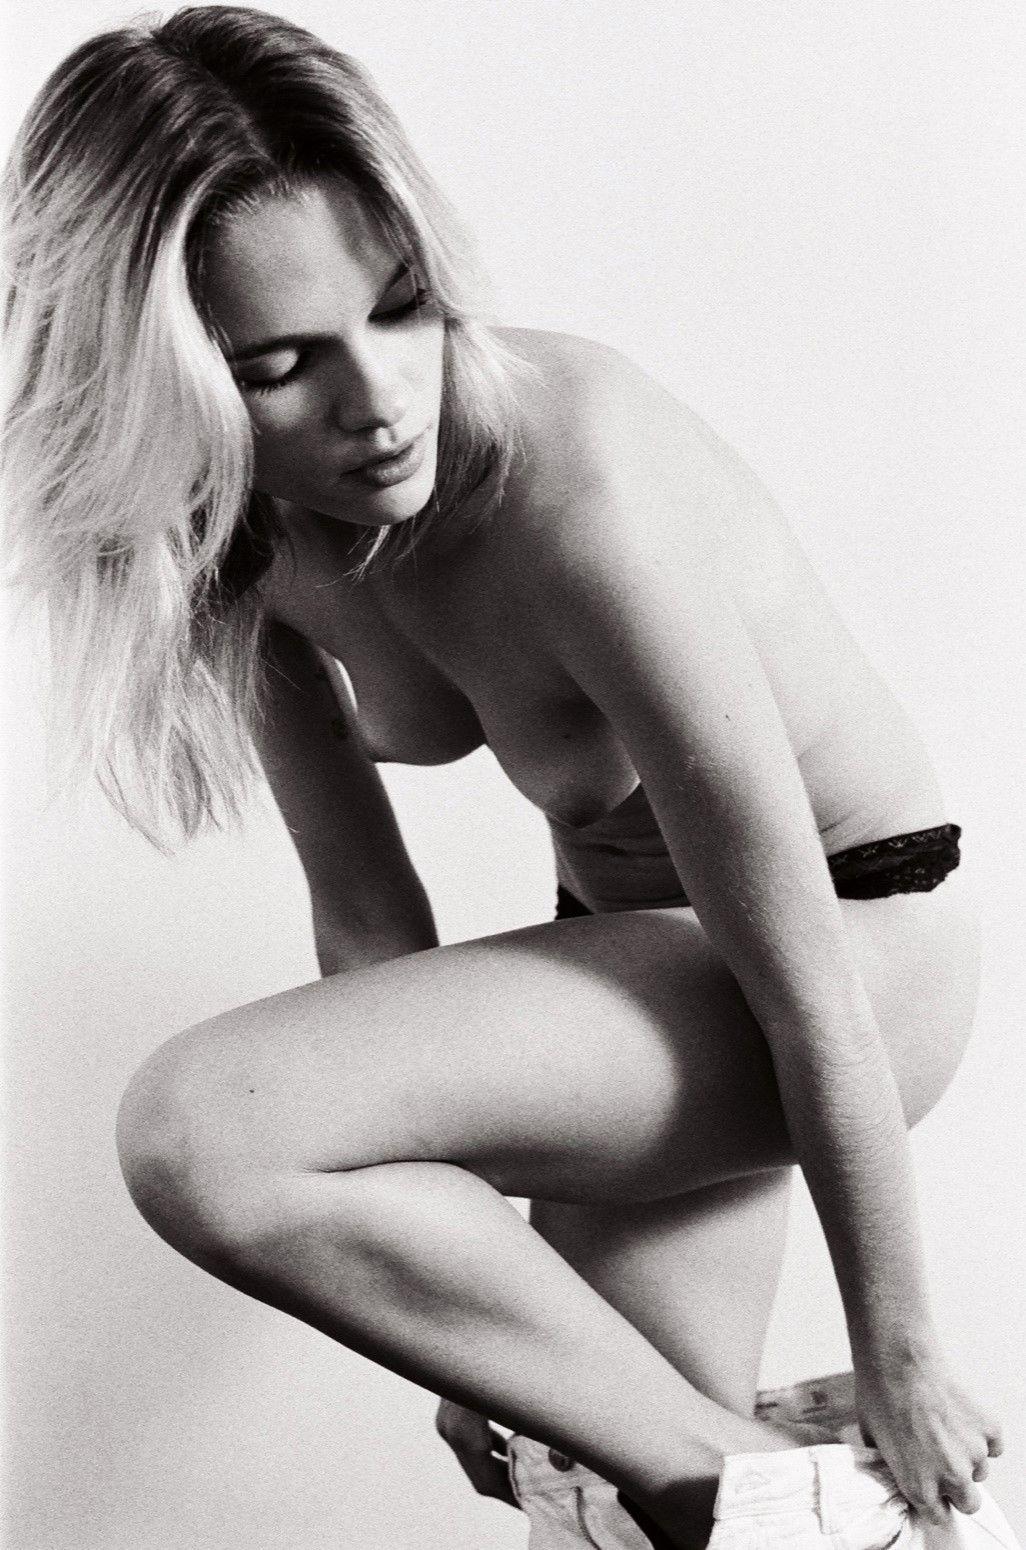 Celebrity Eva Biechy naked (83 foto and video), Pussy, Paparazzi, Boobs, underwear 2006